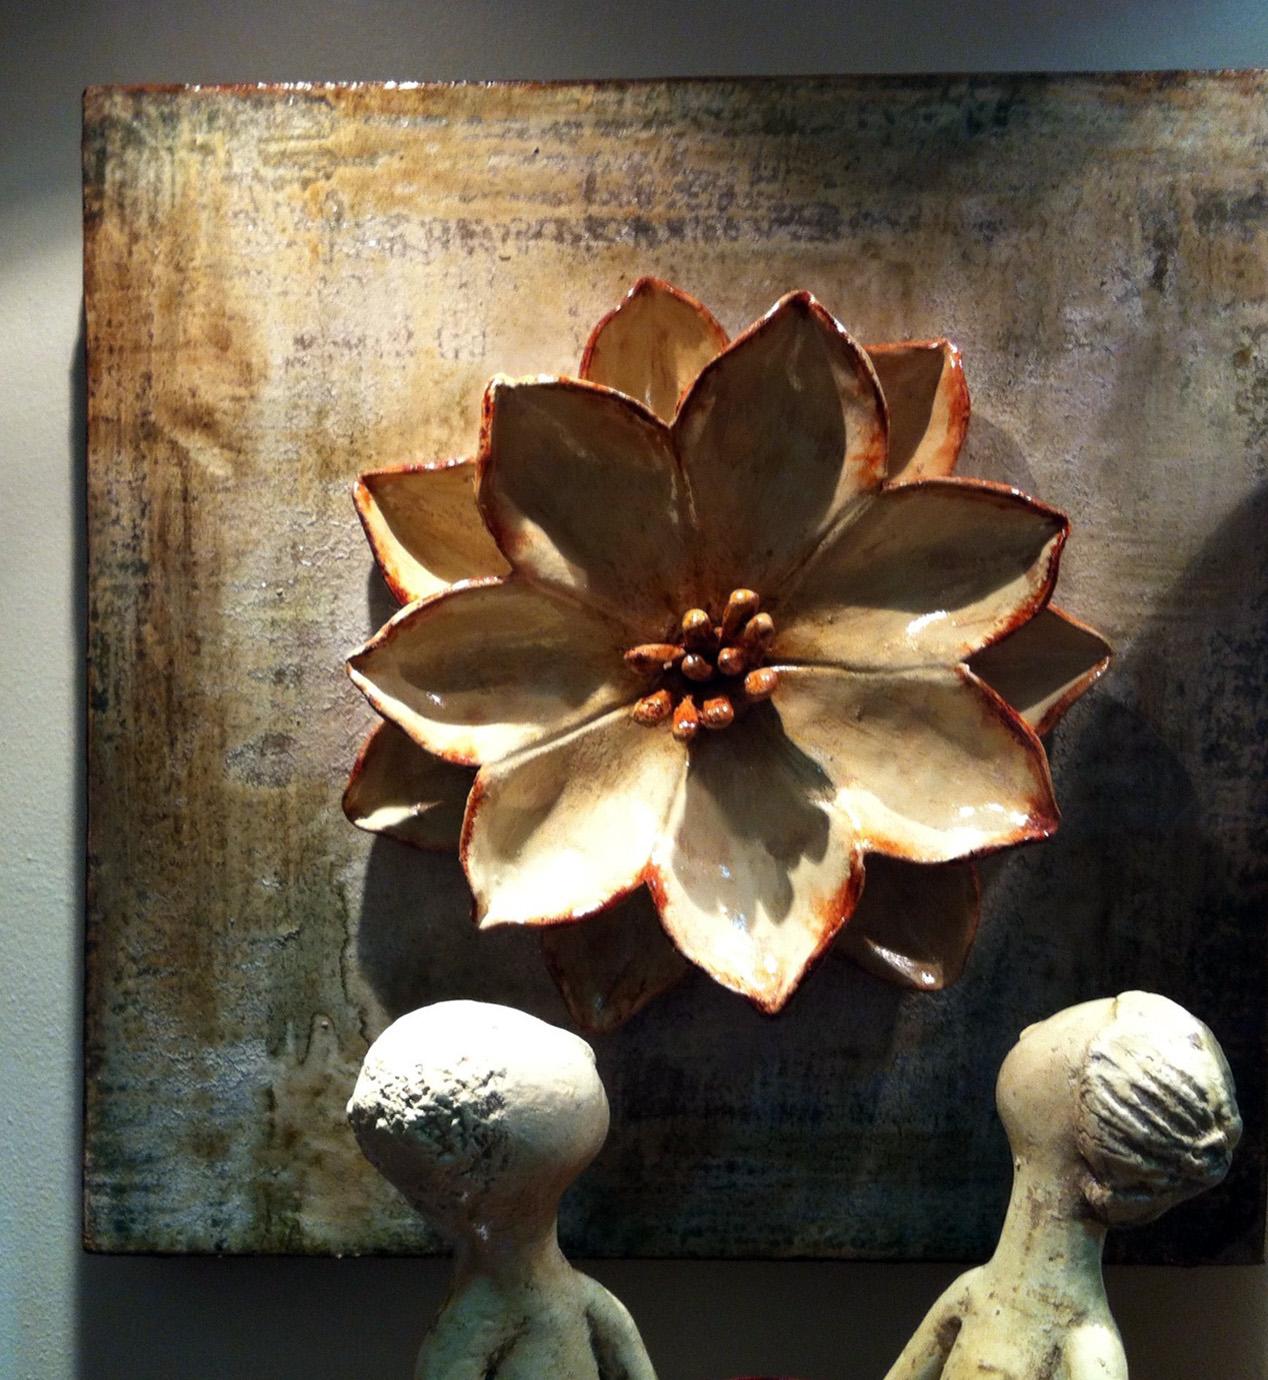 Lotus Flower Art Mexican Artisans Bring...